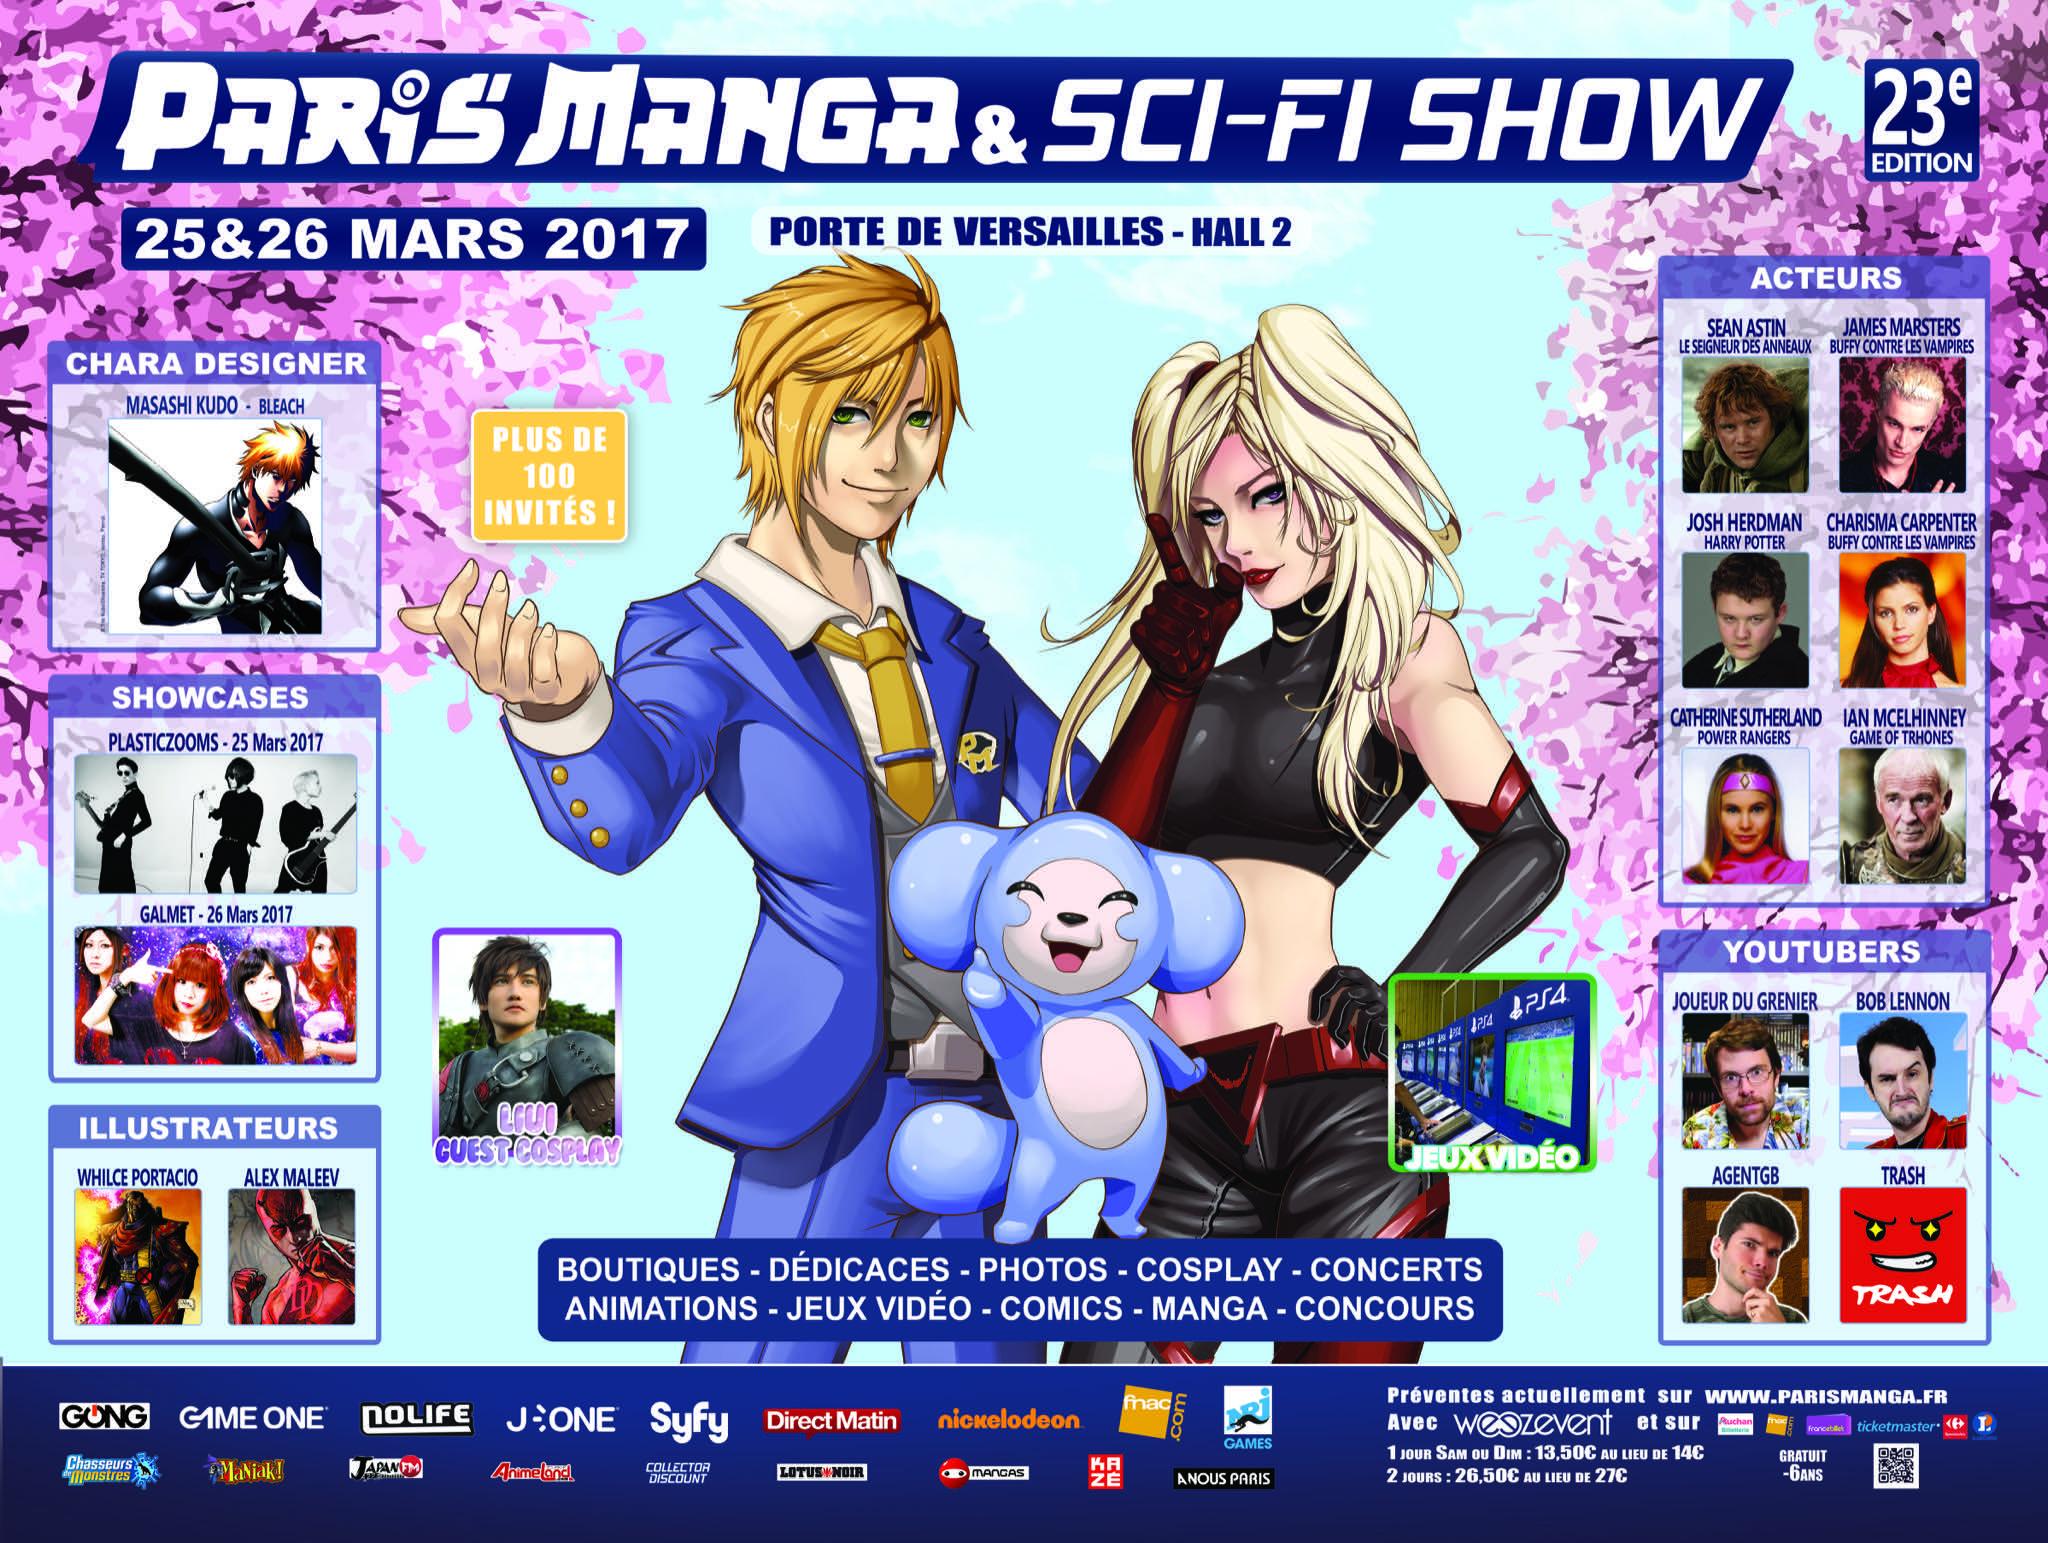 Paris Manga & Sci-Fi Show mars 2017 affiche